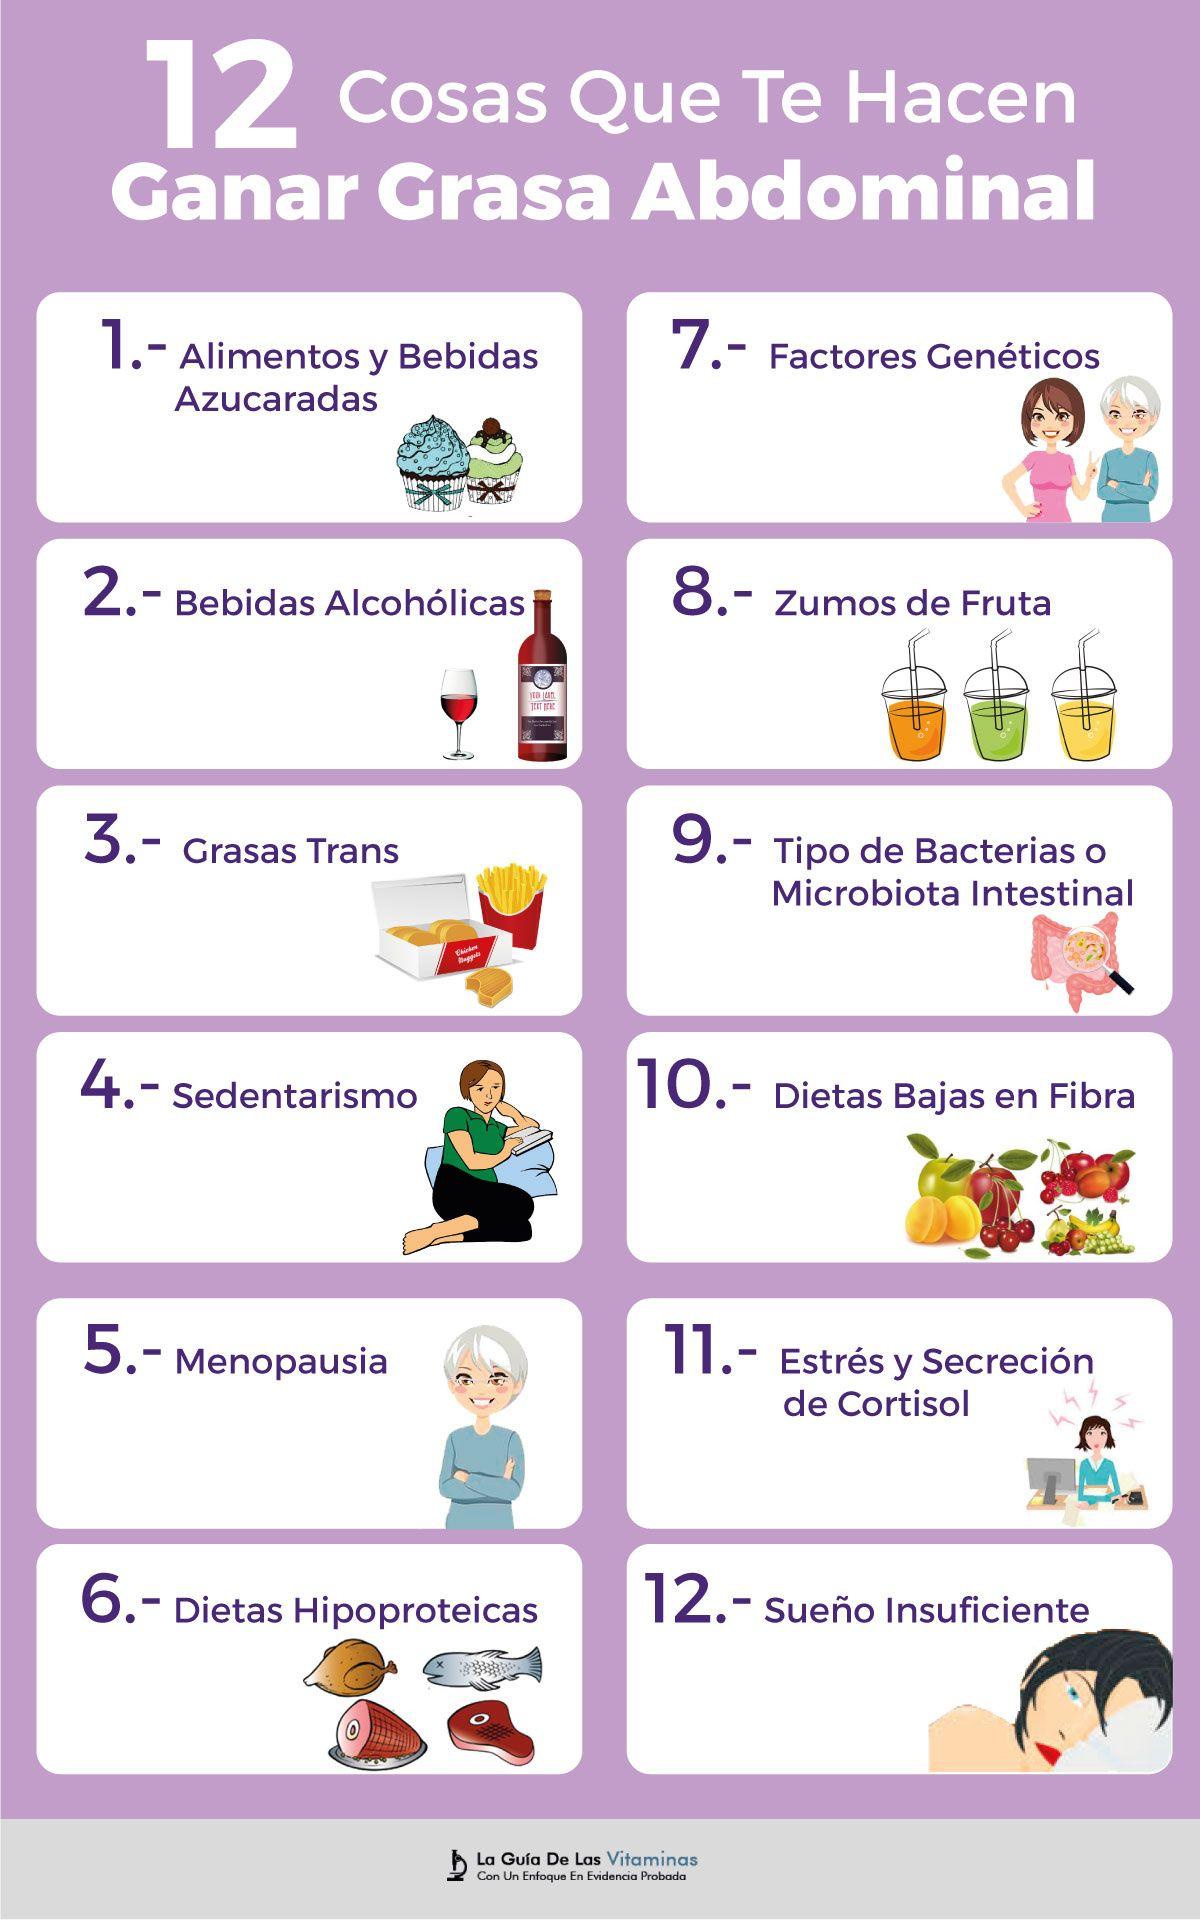 causas de ganar grasa abdominal